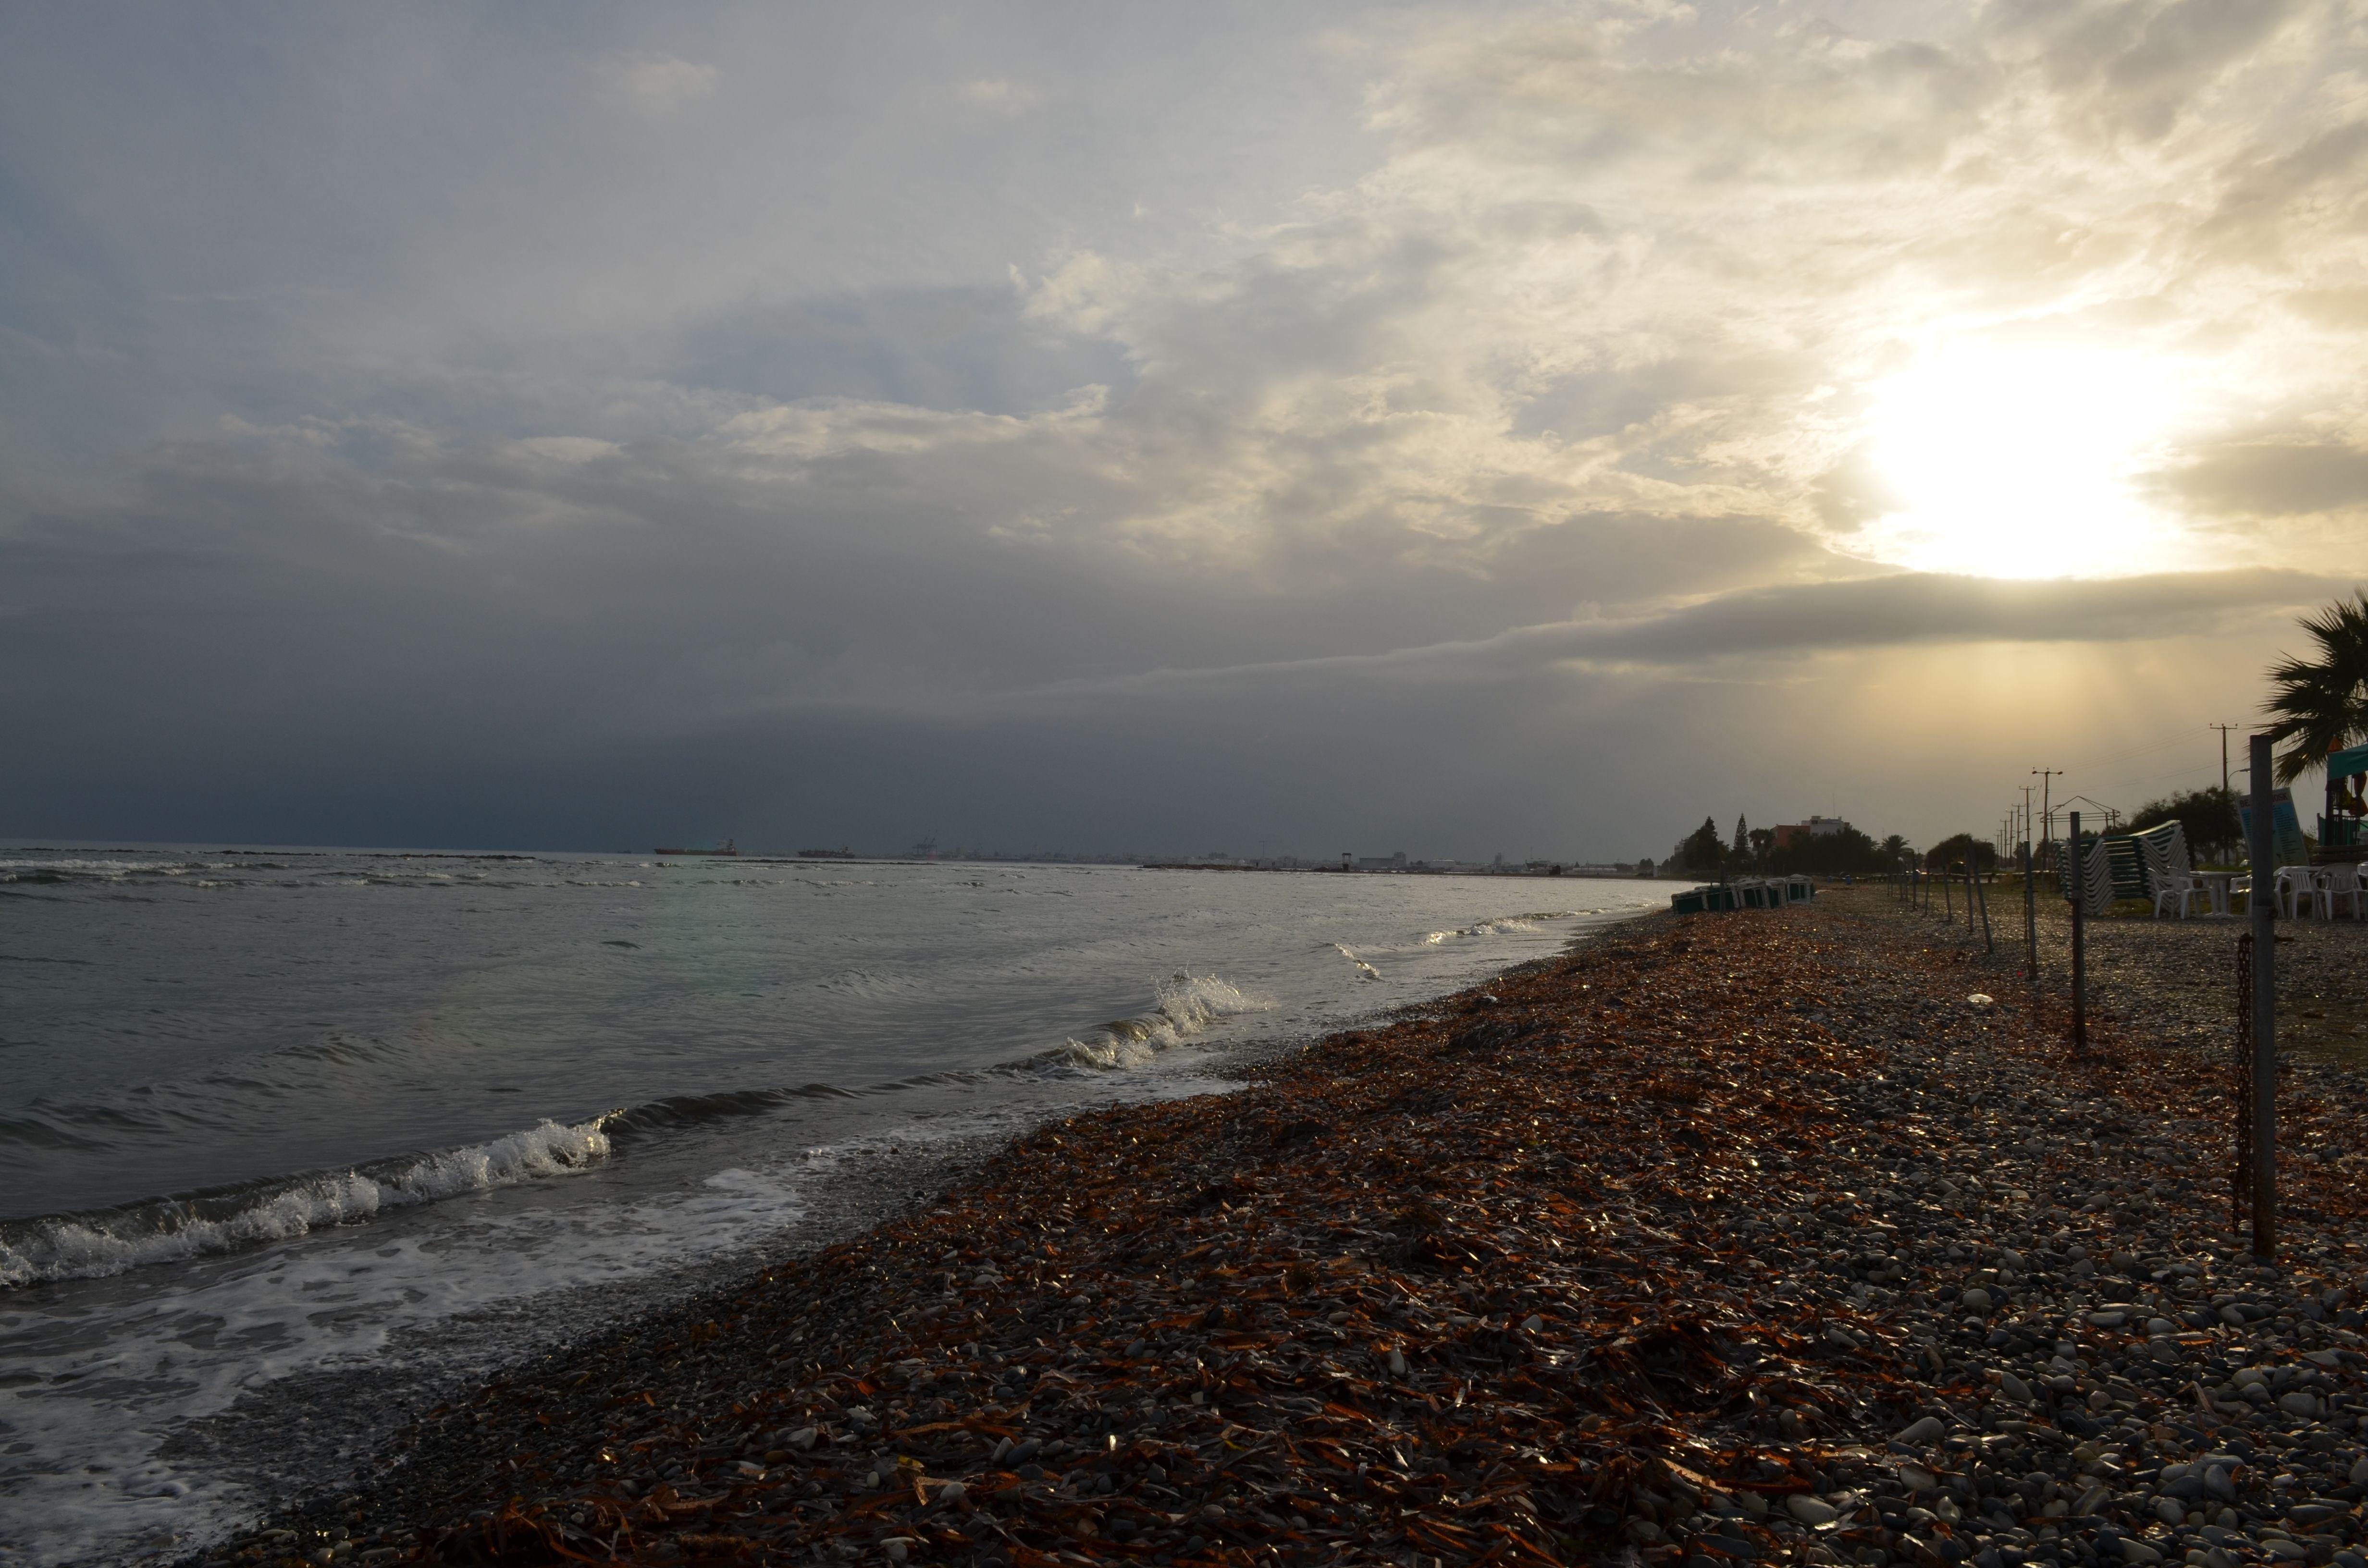 Sunset at Oroklini sea, Cyprus